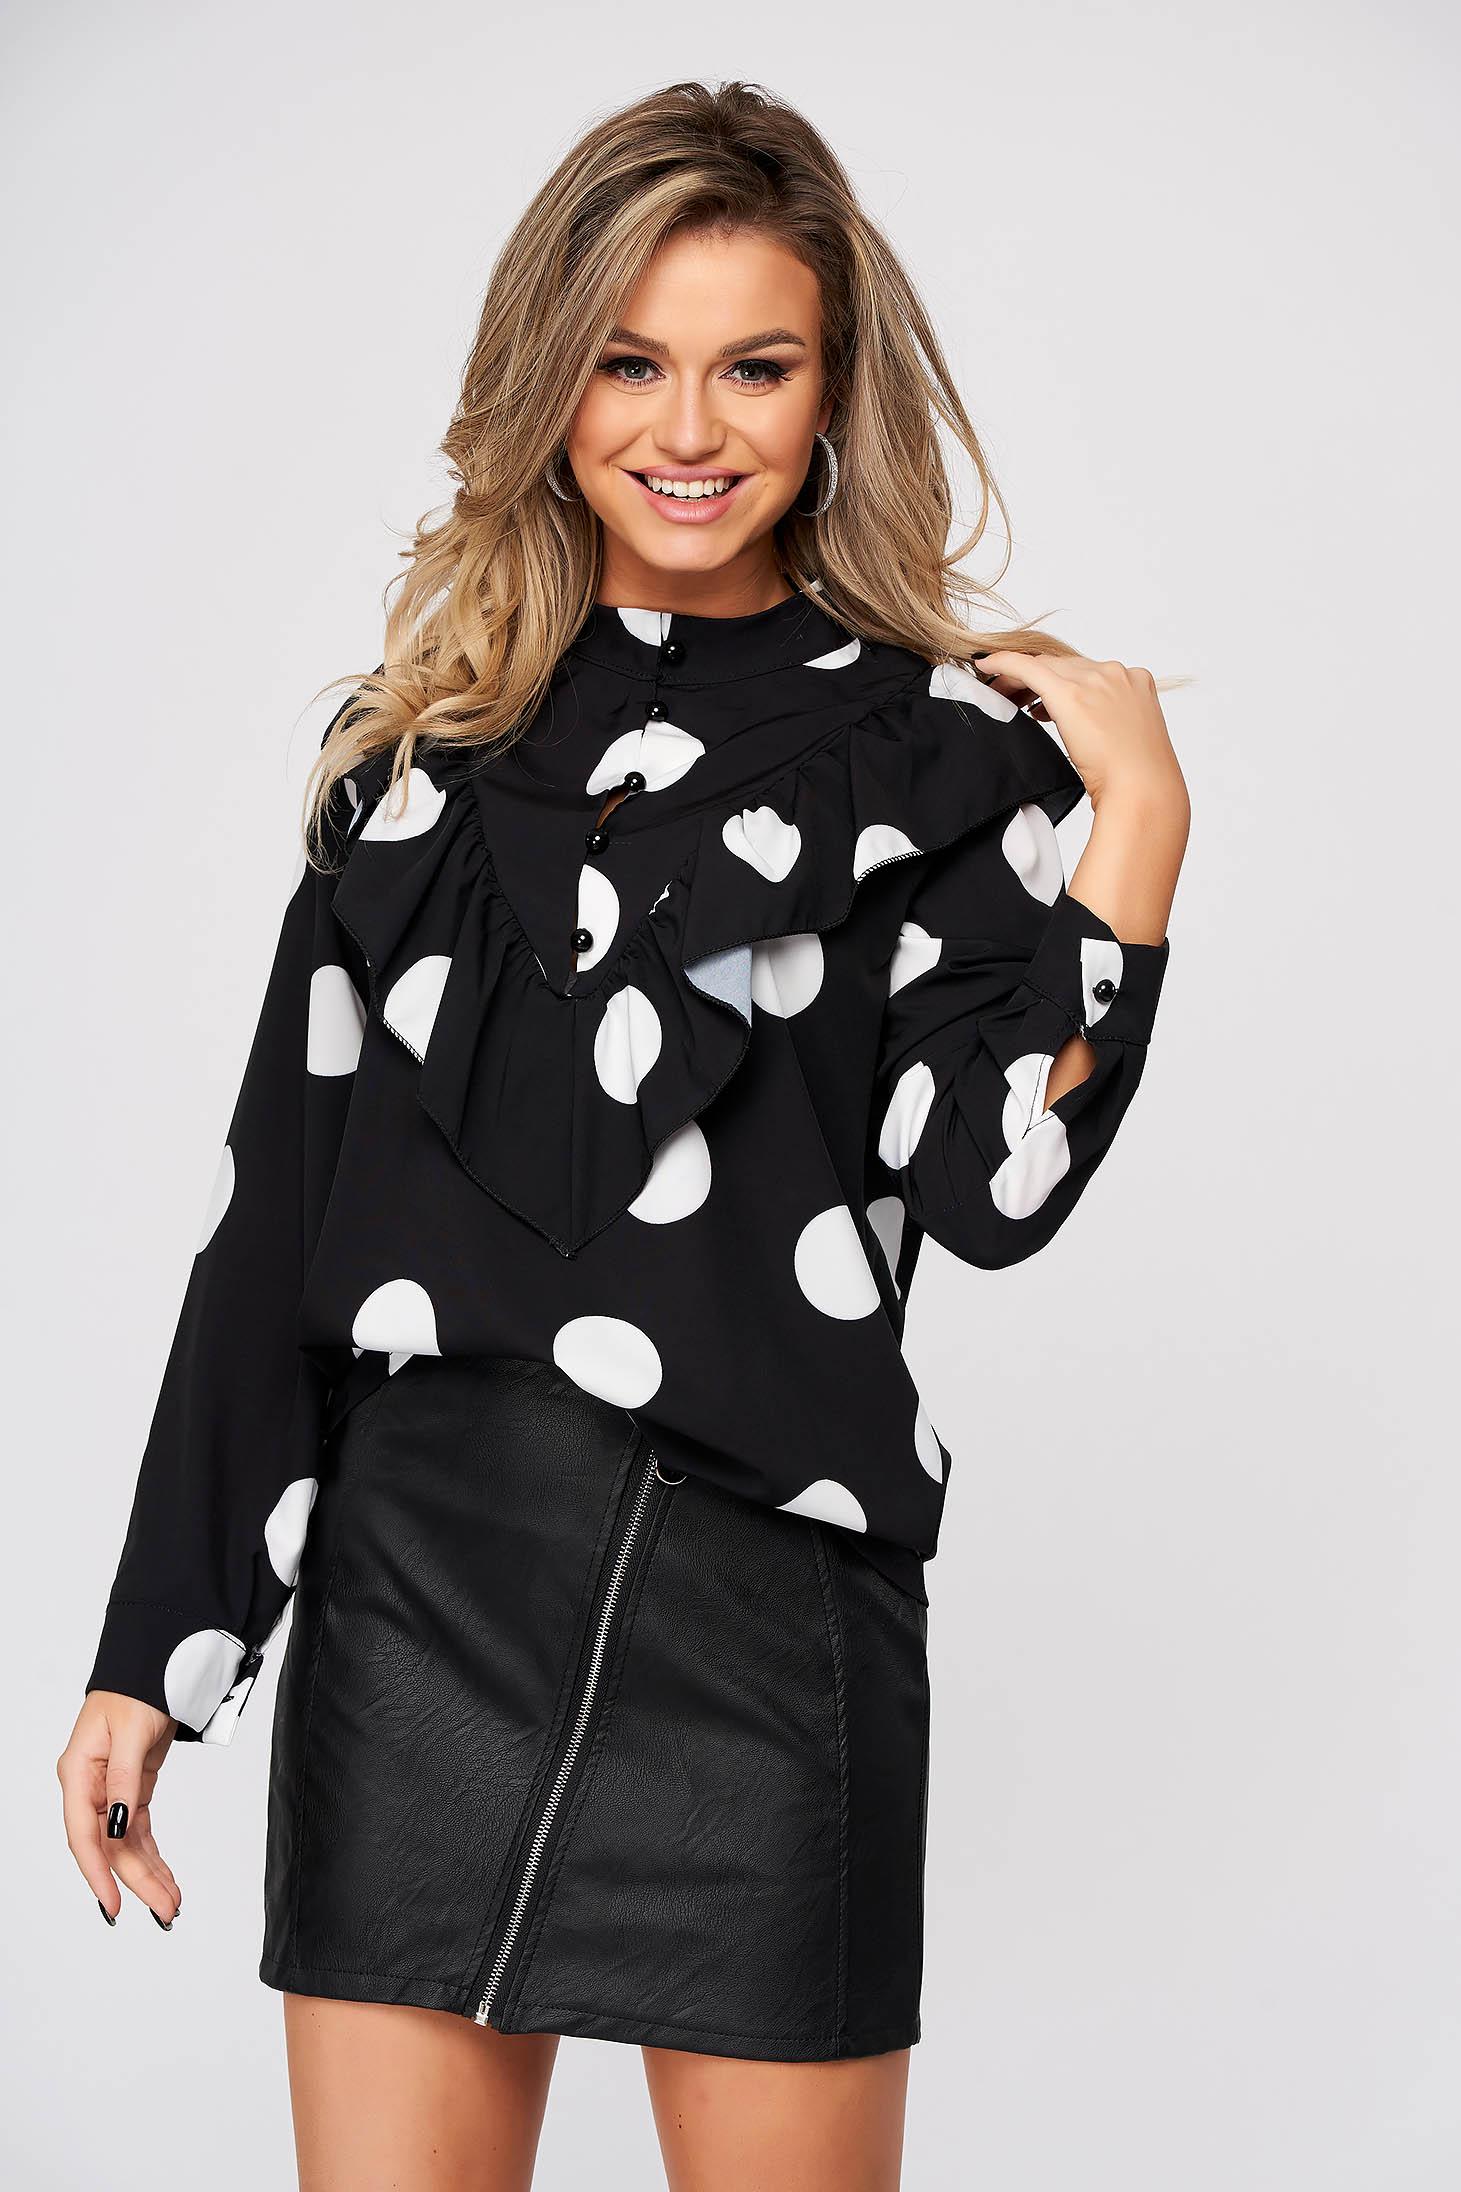 Black women`s shirt casual flared with ruffle details thin fabric dots print